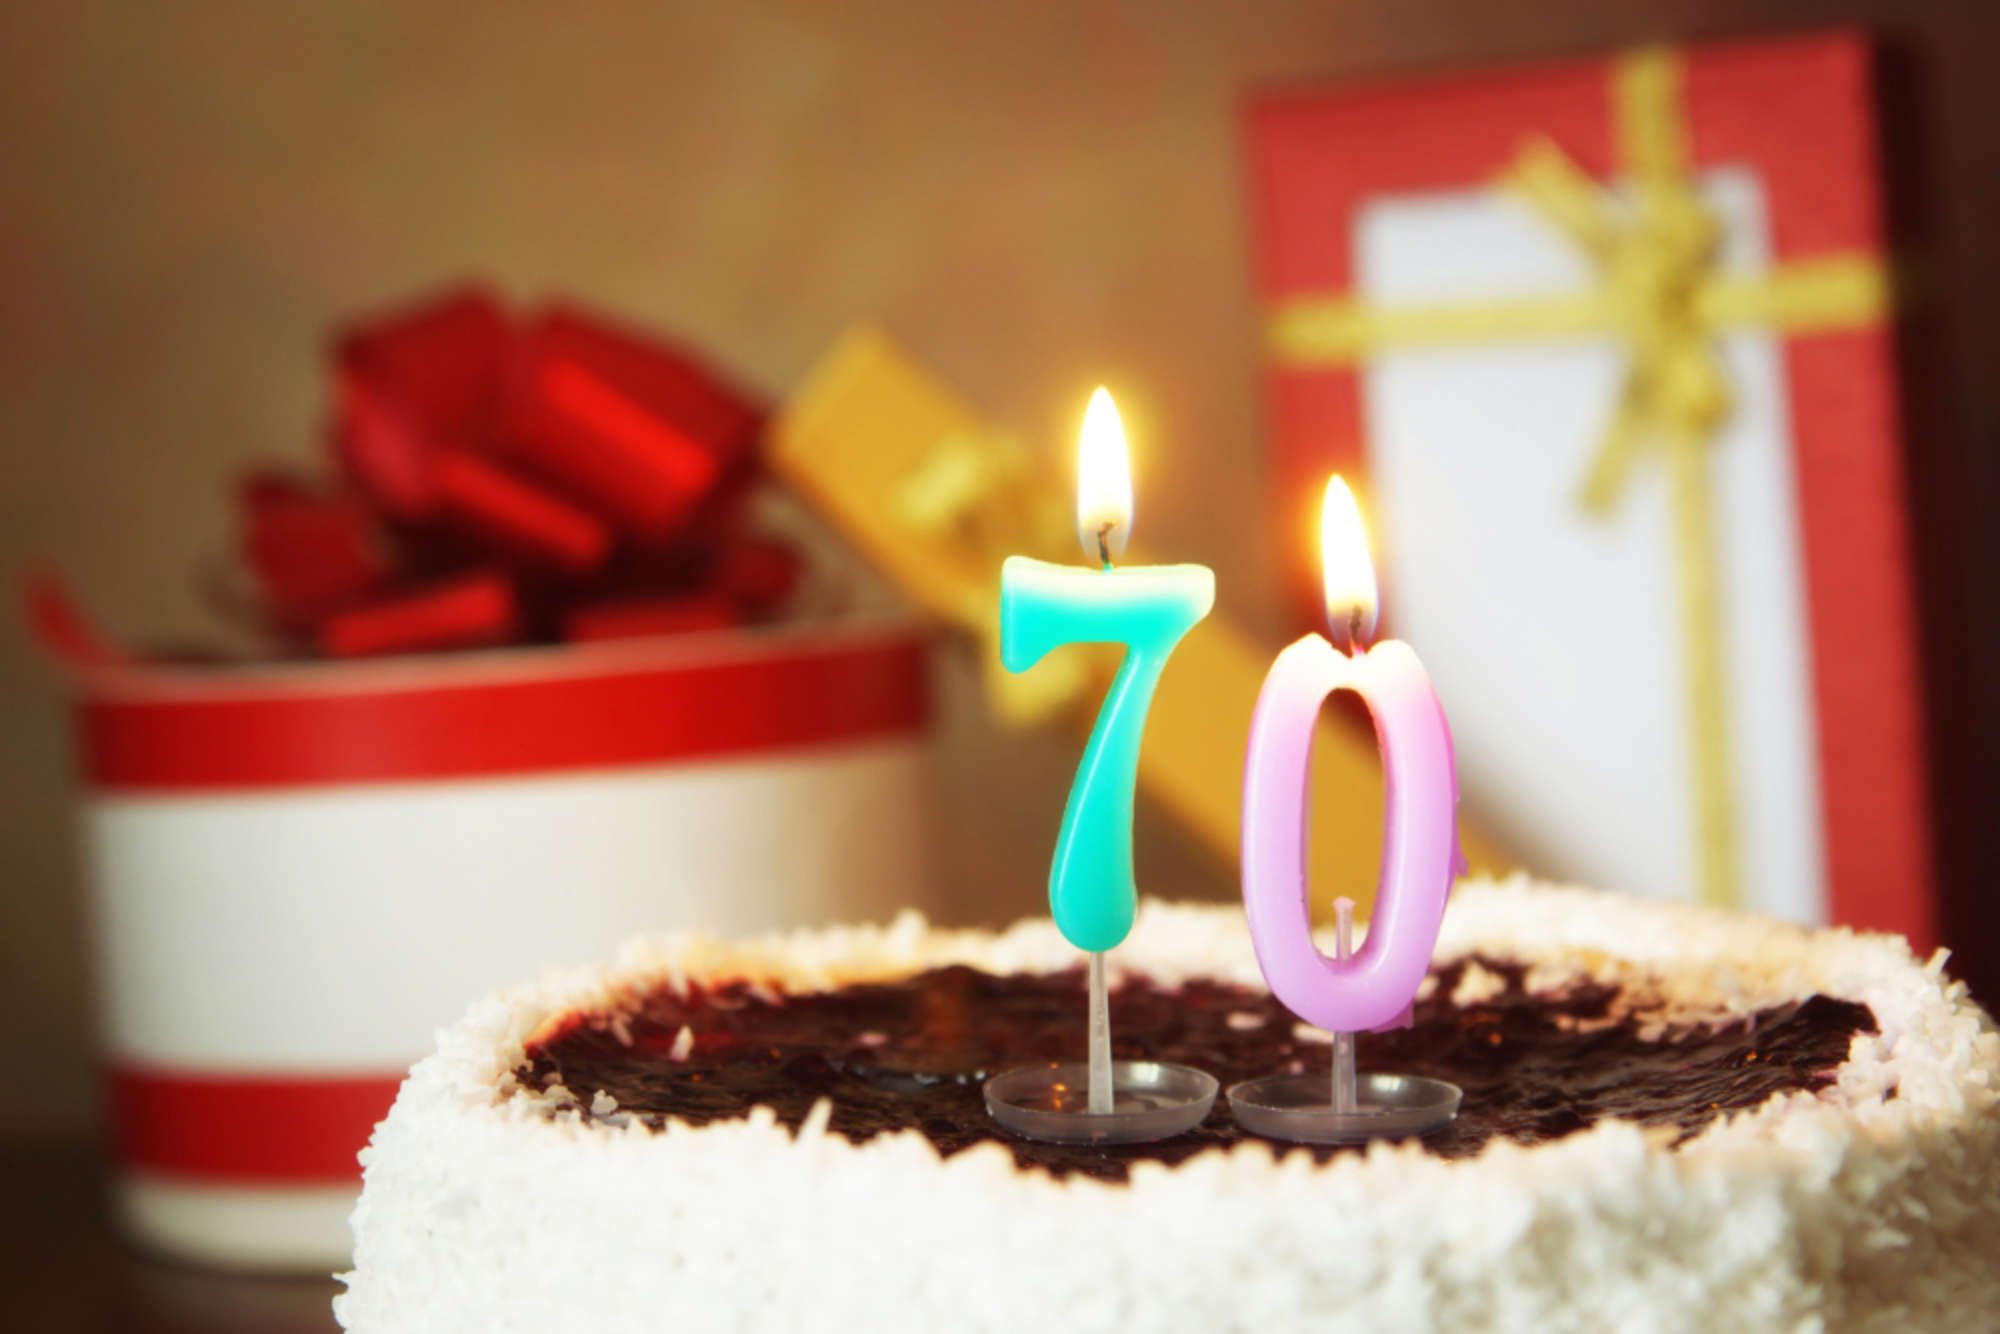 70 Bday Cake